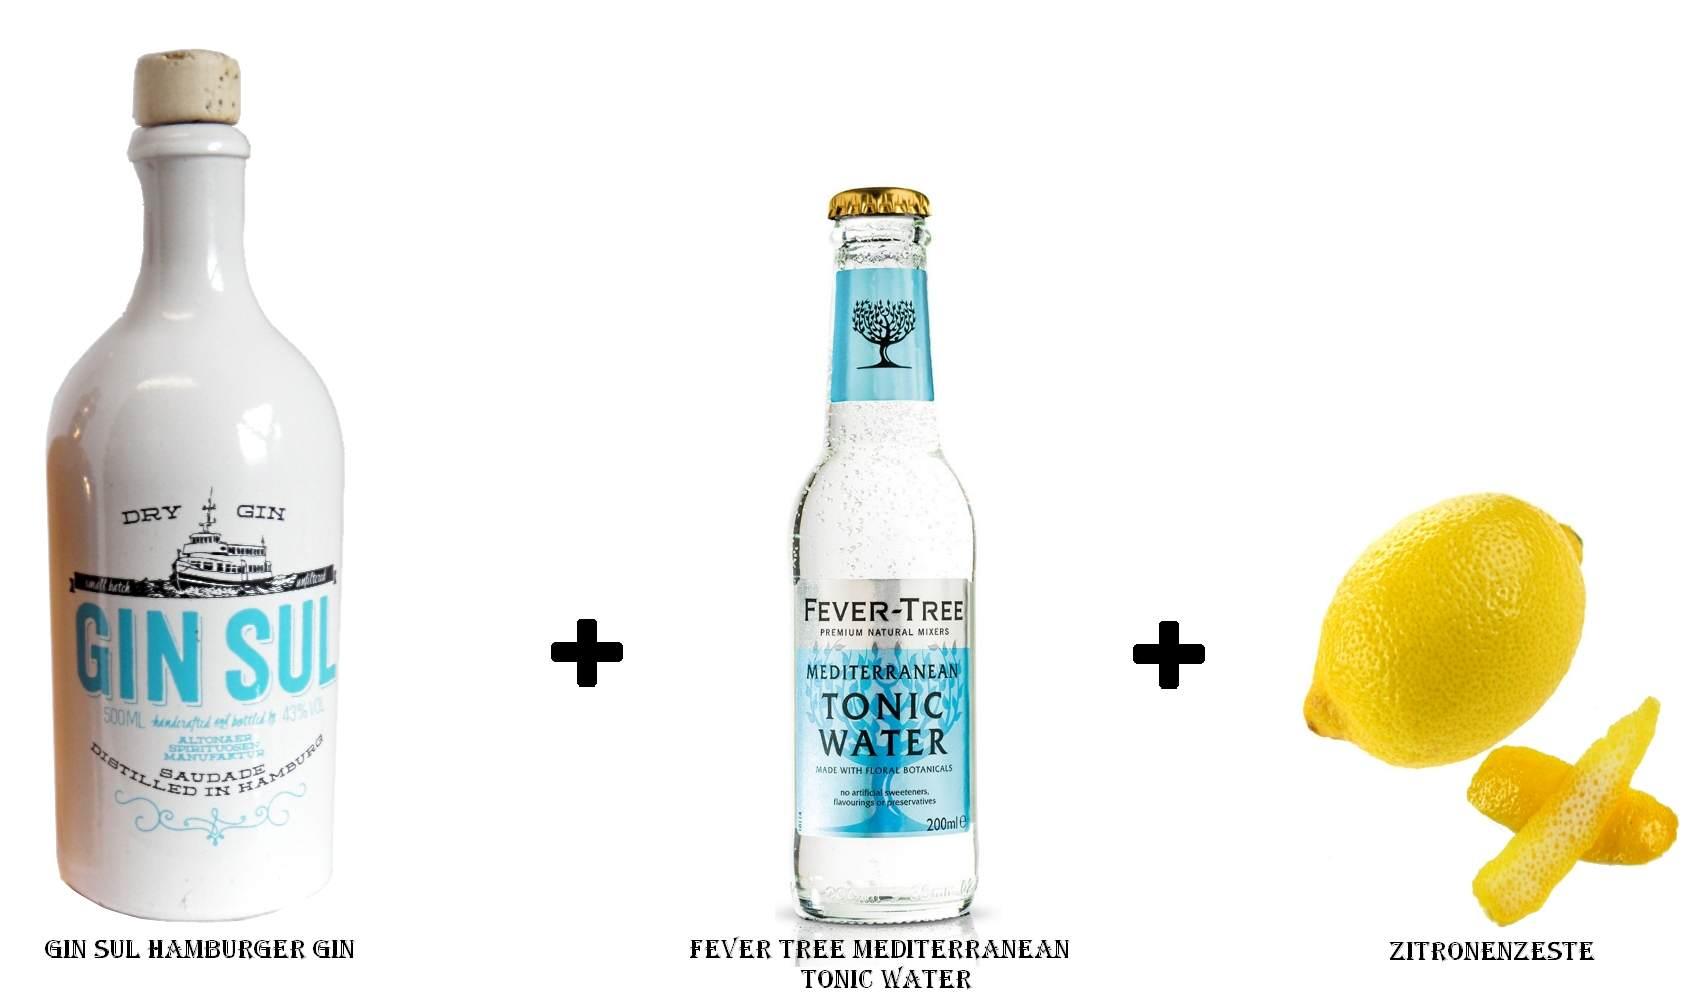 Gin Sul Hamburger Gin + Fever Tree Mediterranean Tonic Water + Zitronenzeste